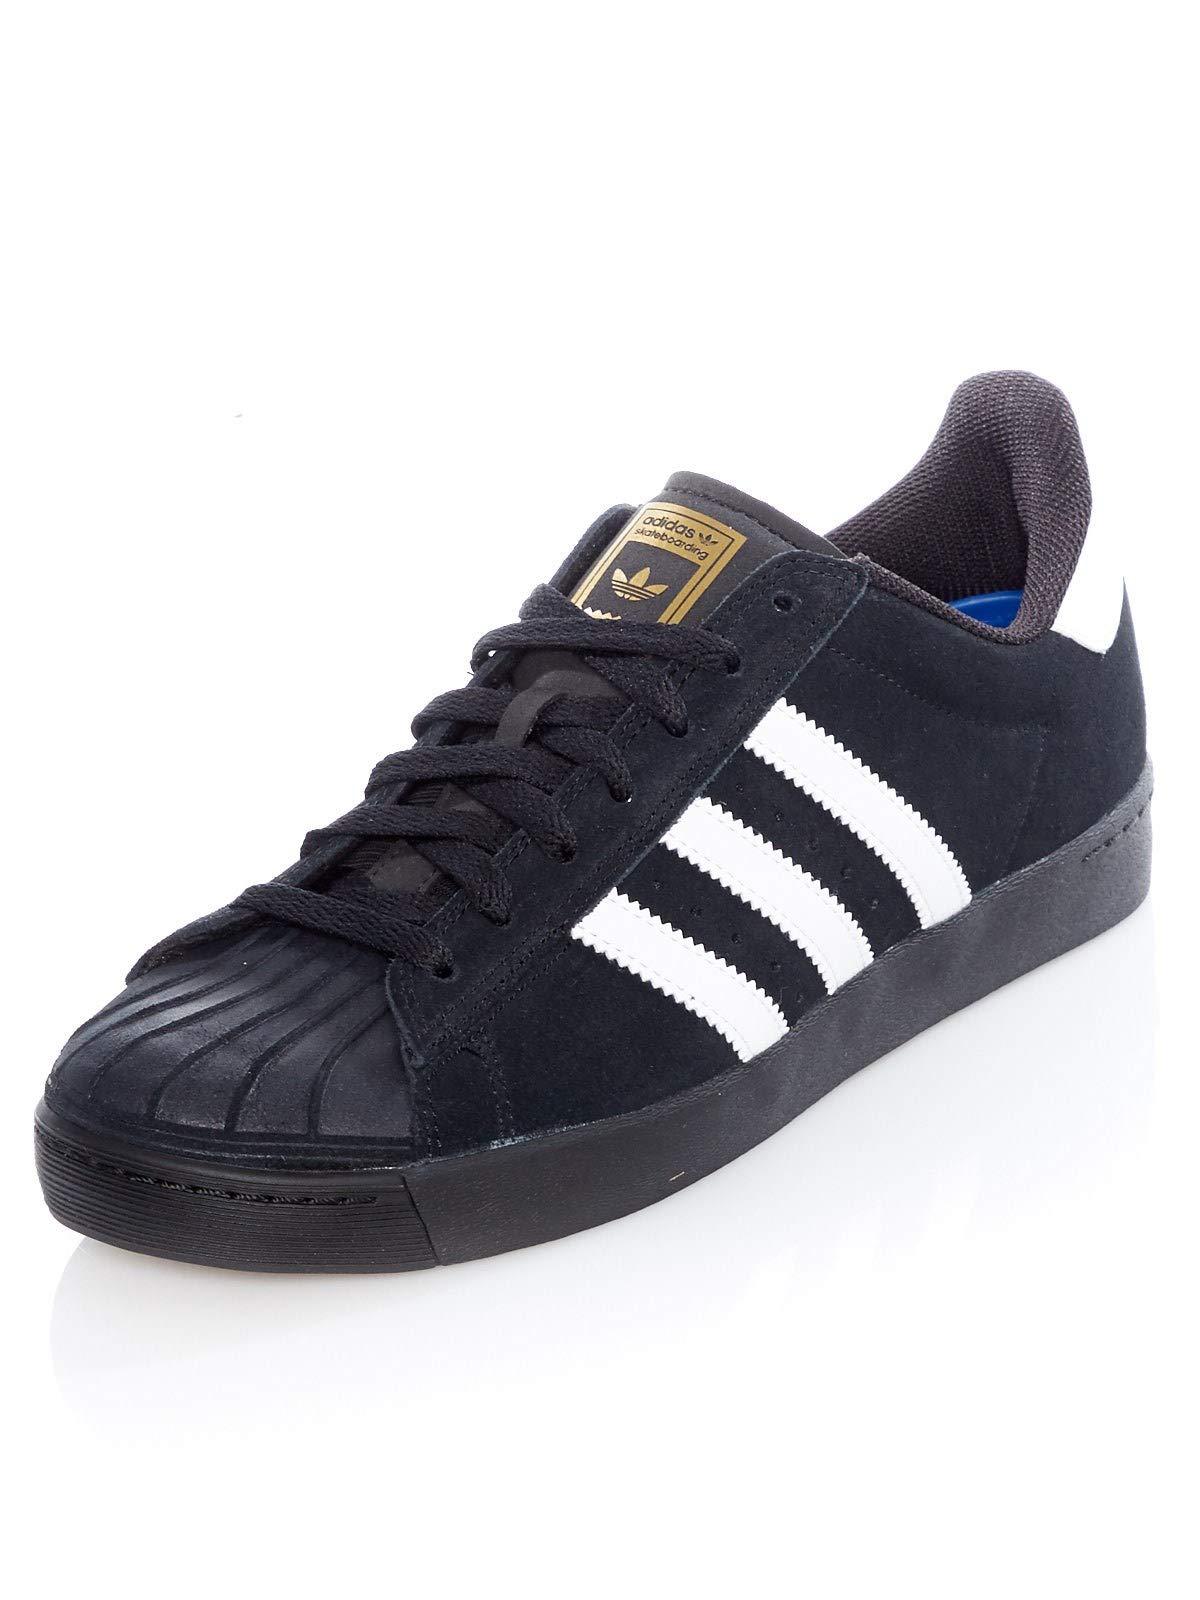 adidas Superstar Vulc Adv core black